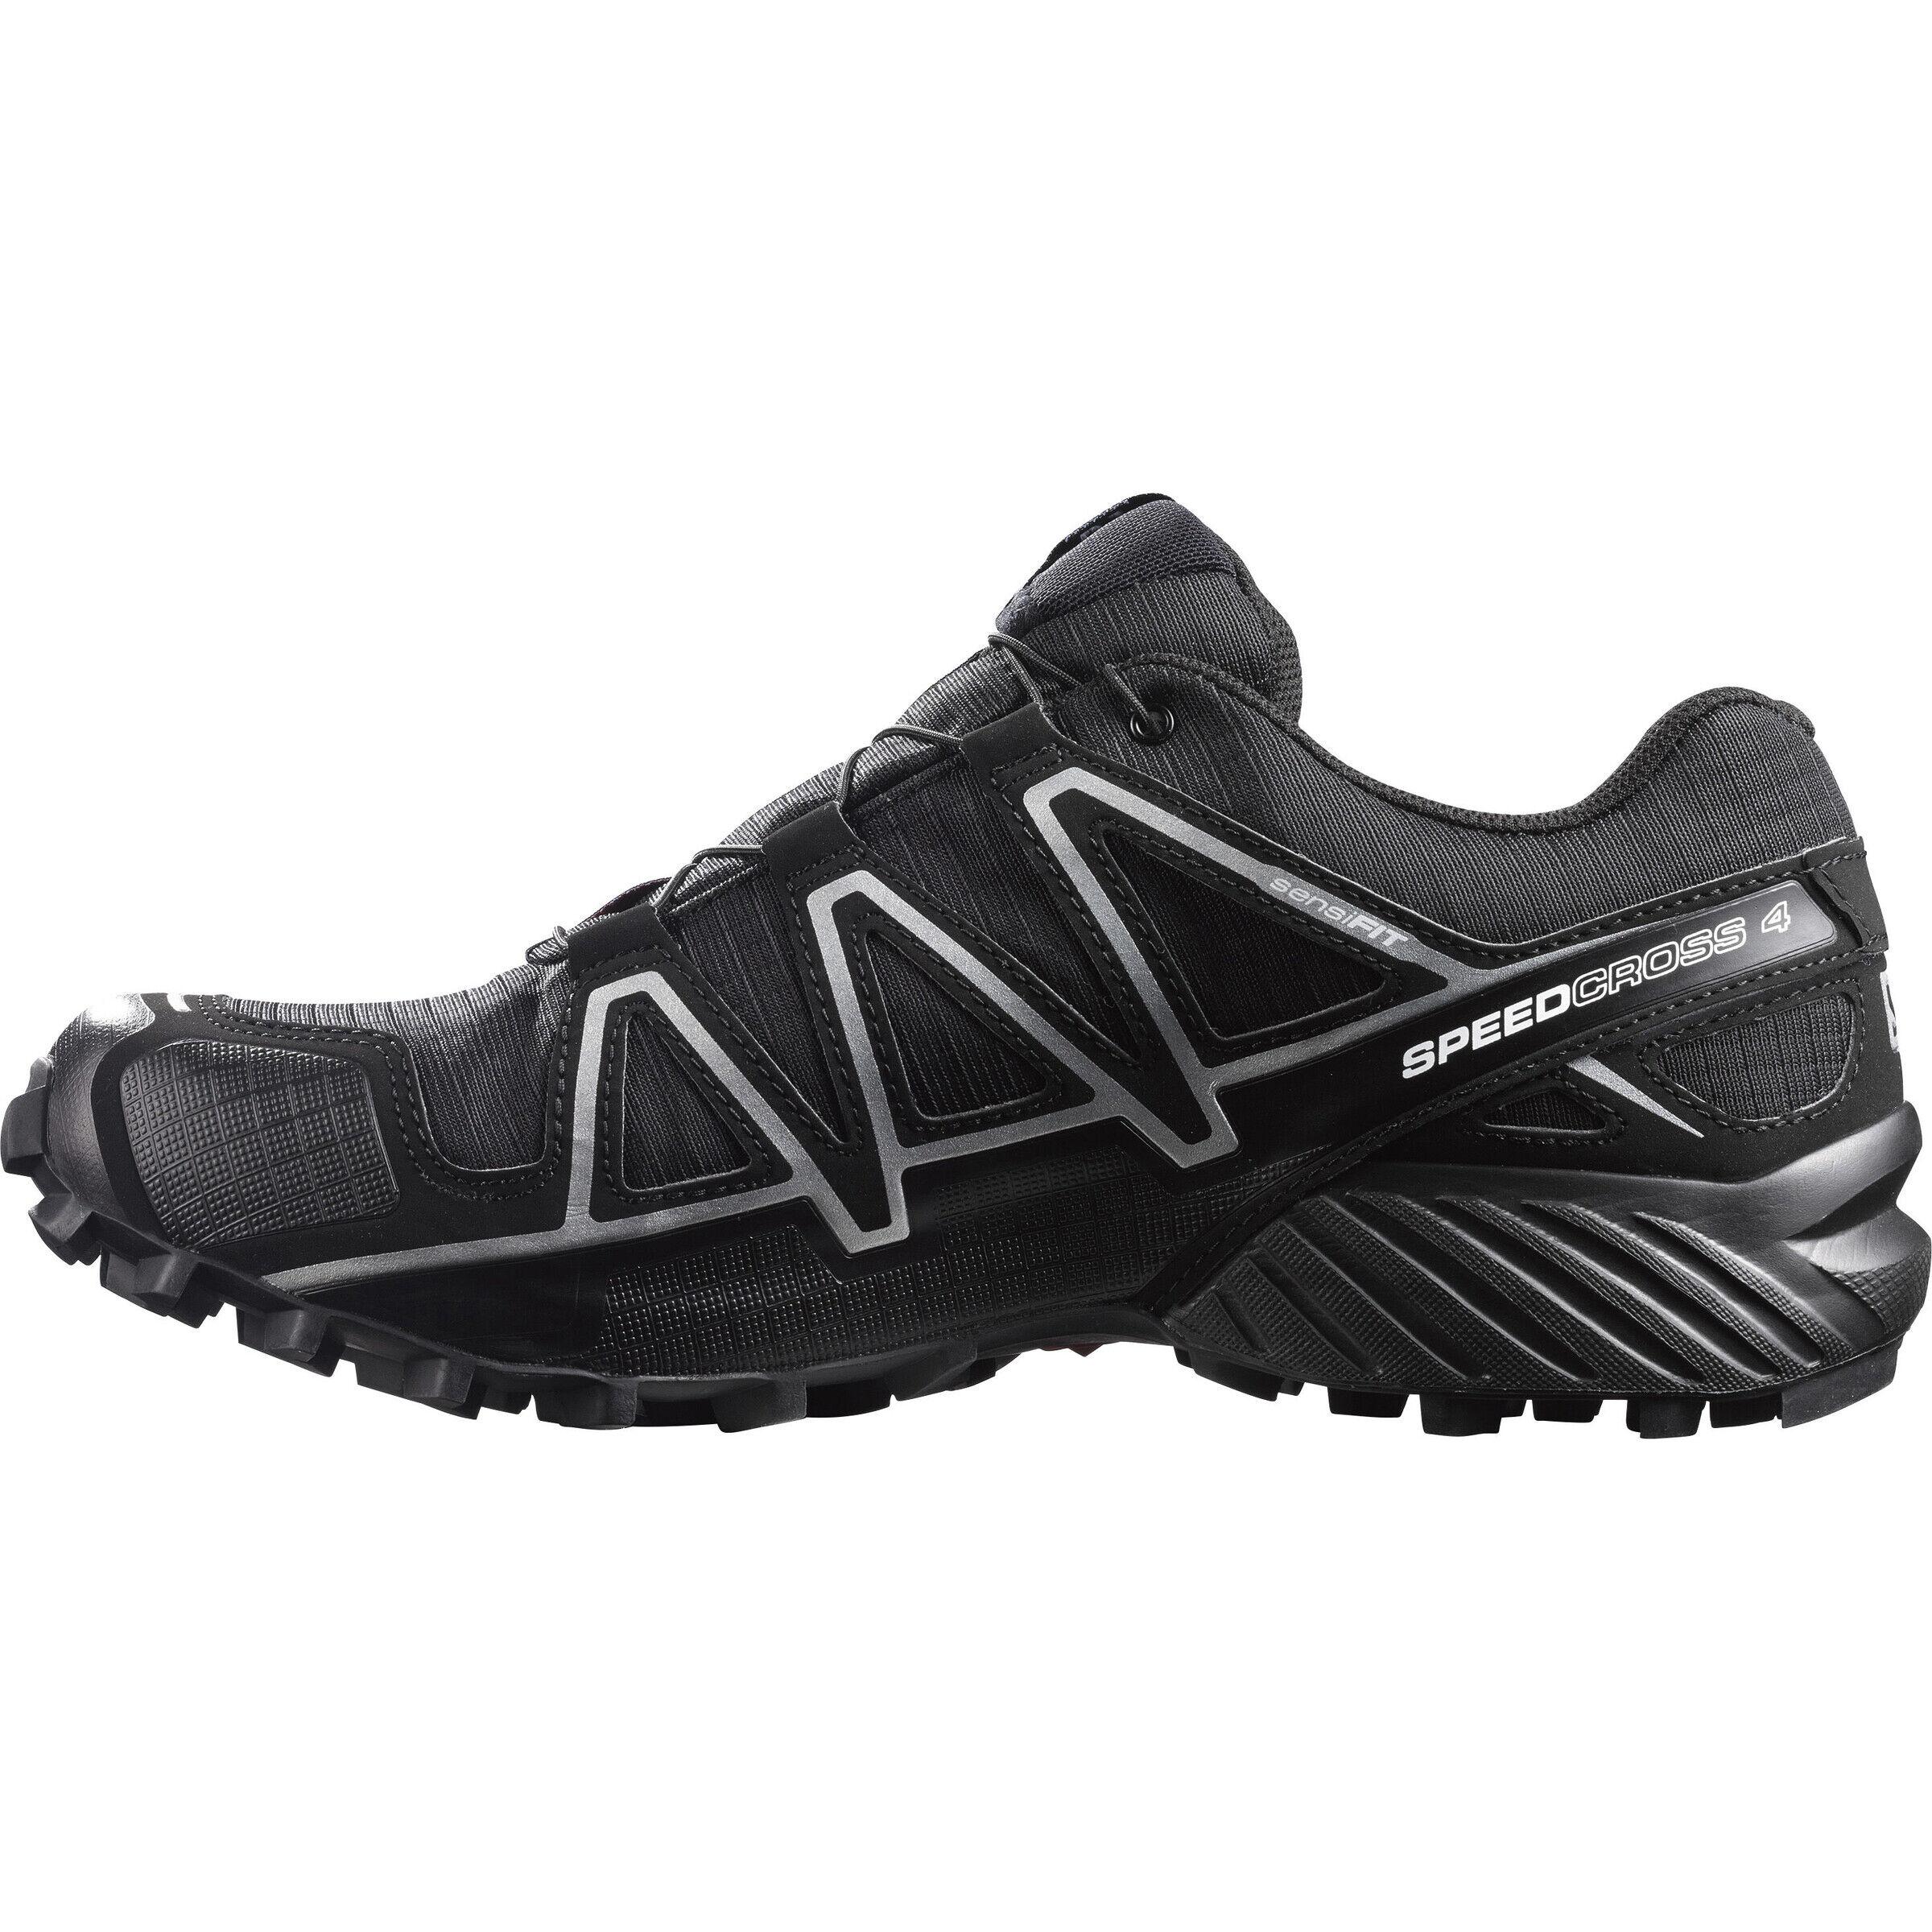 Salomon Speedcross 4 GTX Schuhe Herren blackblacksilver metallic x